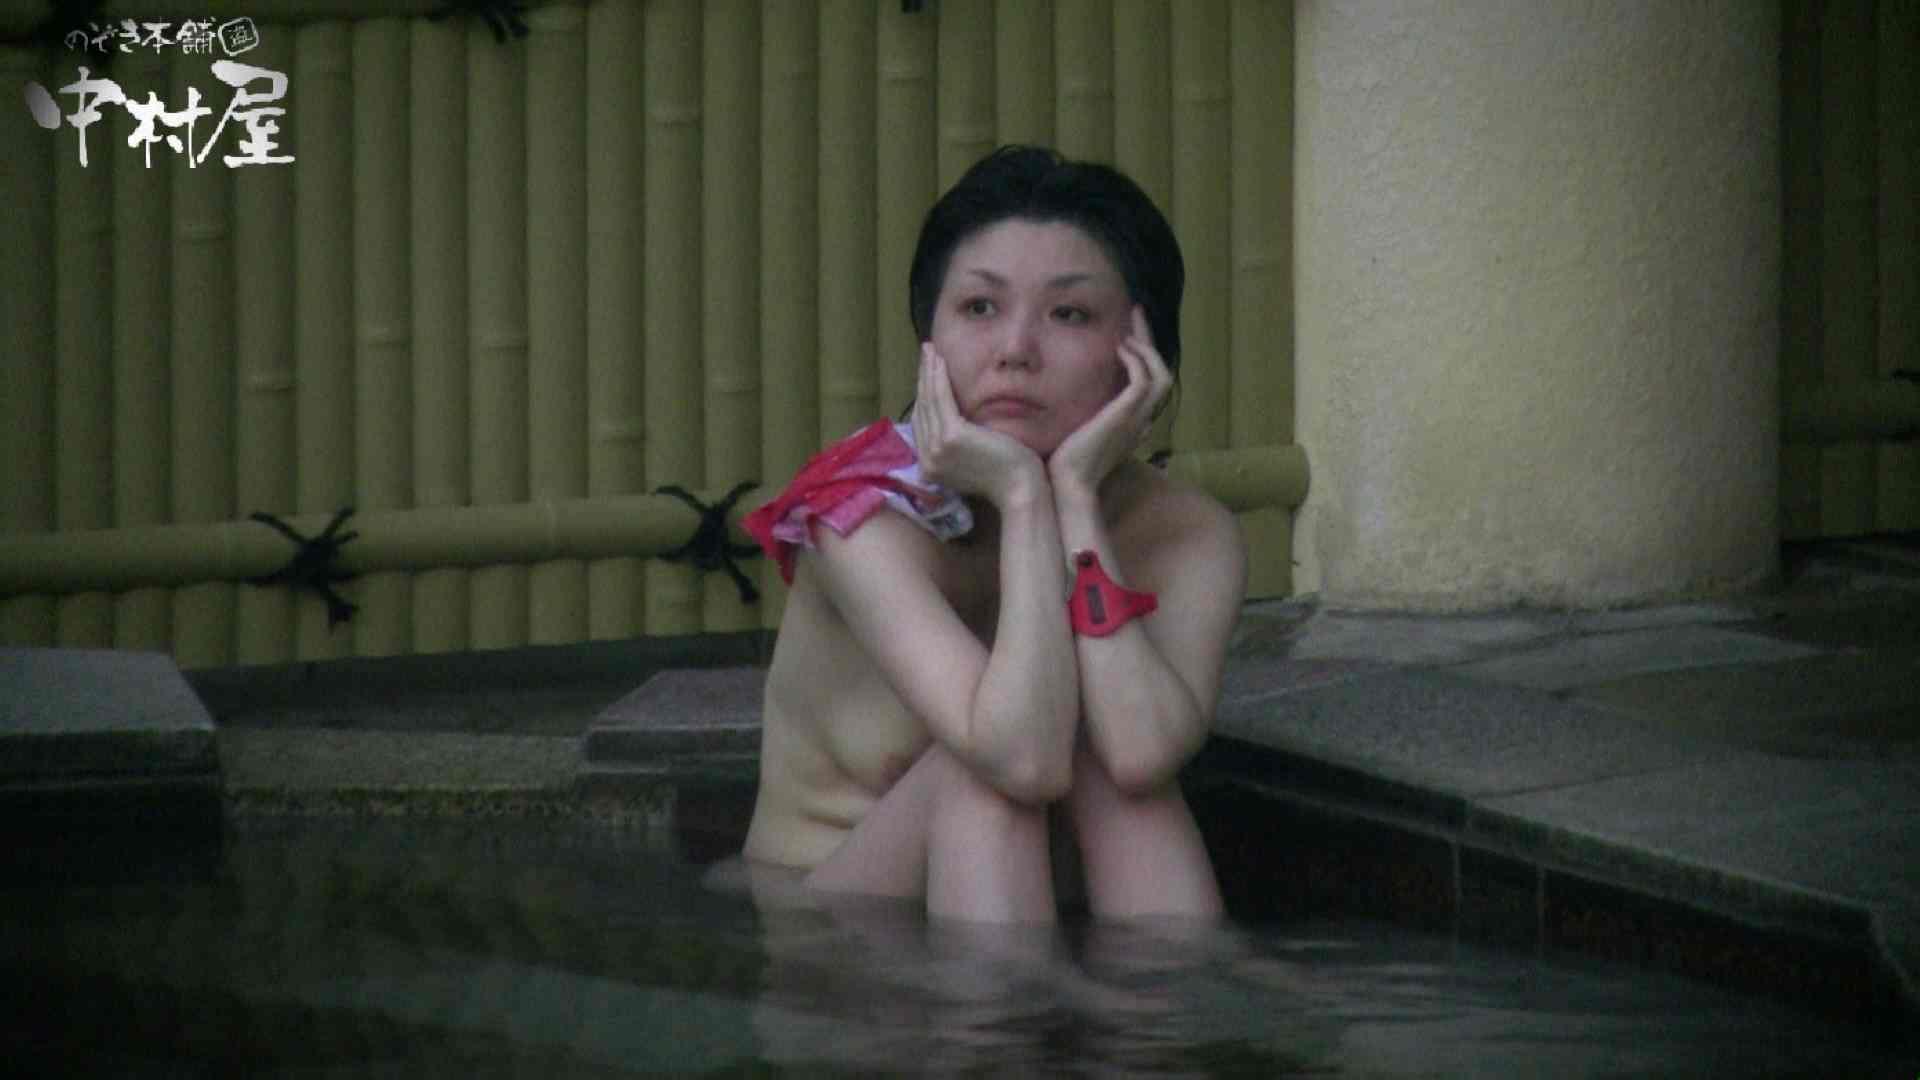 Aquaな露天風呂Vol.884 盗撮 AV無料 80枚 80